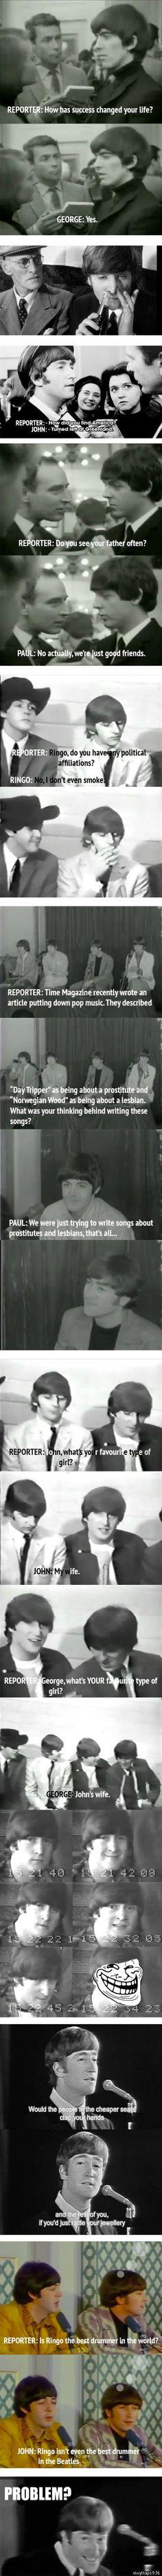 Problem? - The Beatles